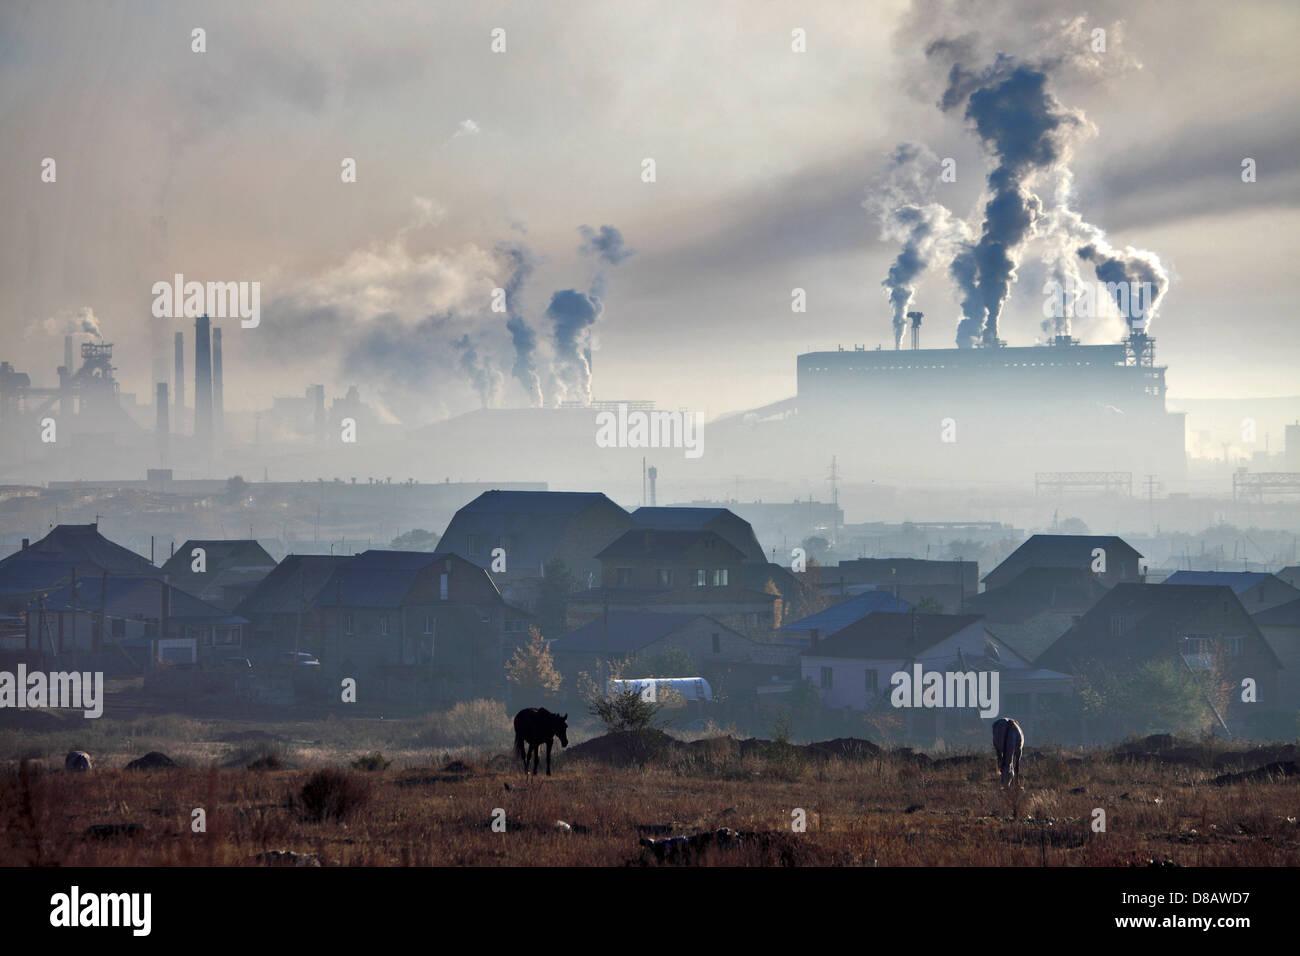 Karaganda - Inquinamento atmosferico da acciaio-opere ( Arselor Mittal Temirtau ) Immagini Stock